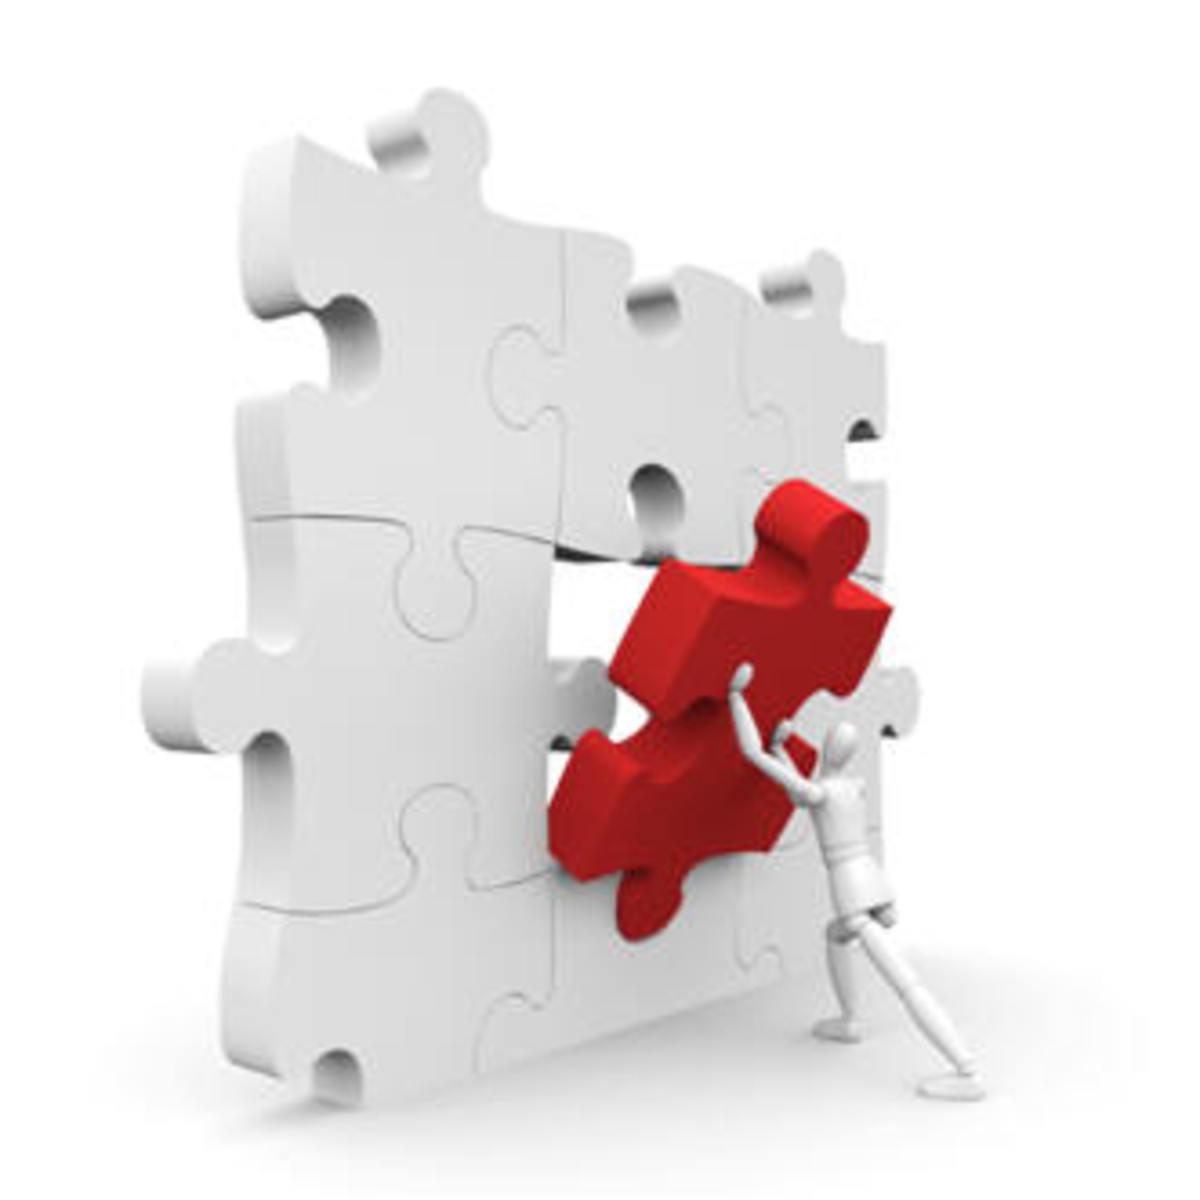 top-effective-leadership-skills-and-qualities-2